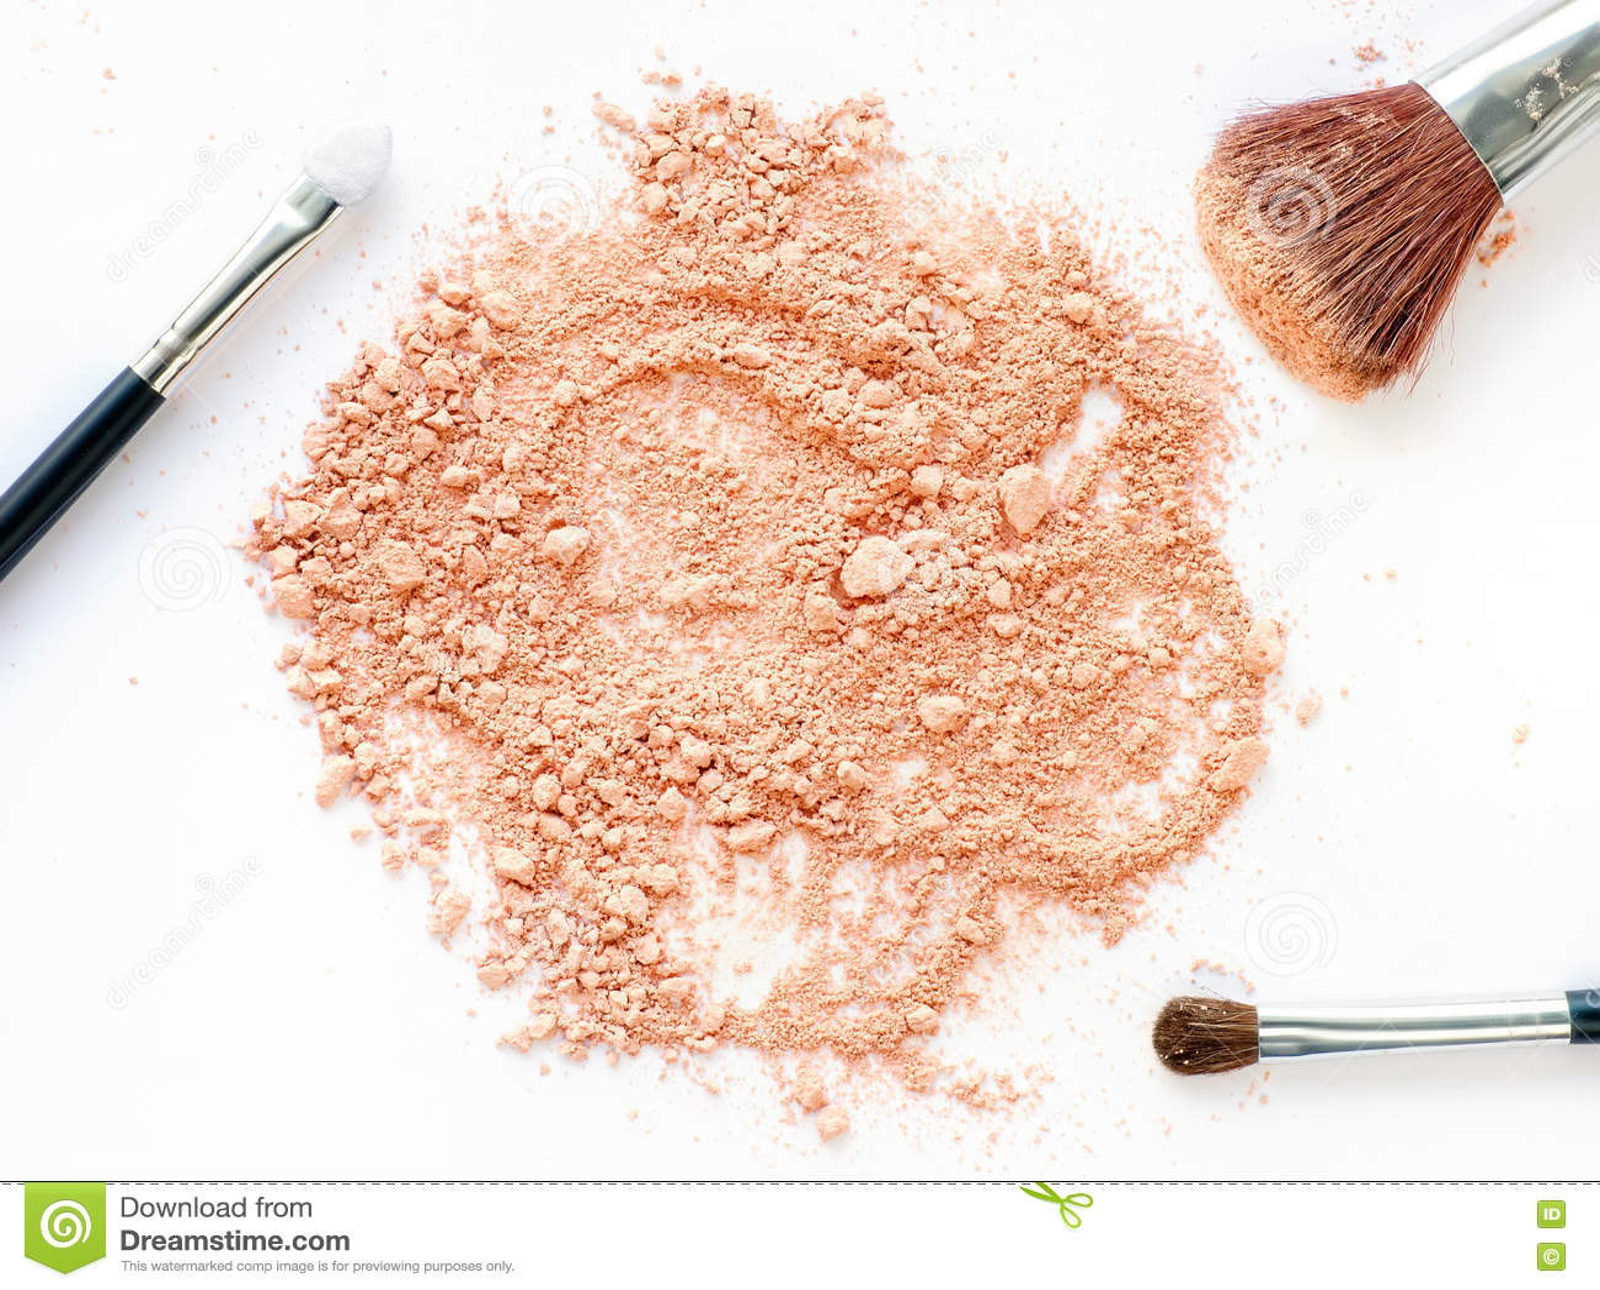 Crushed powder with make-up brushes